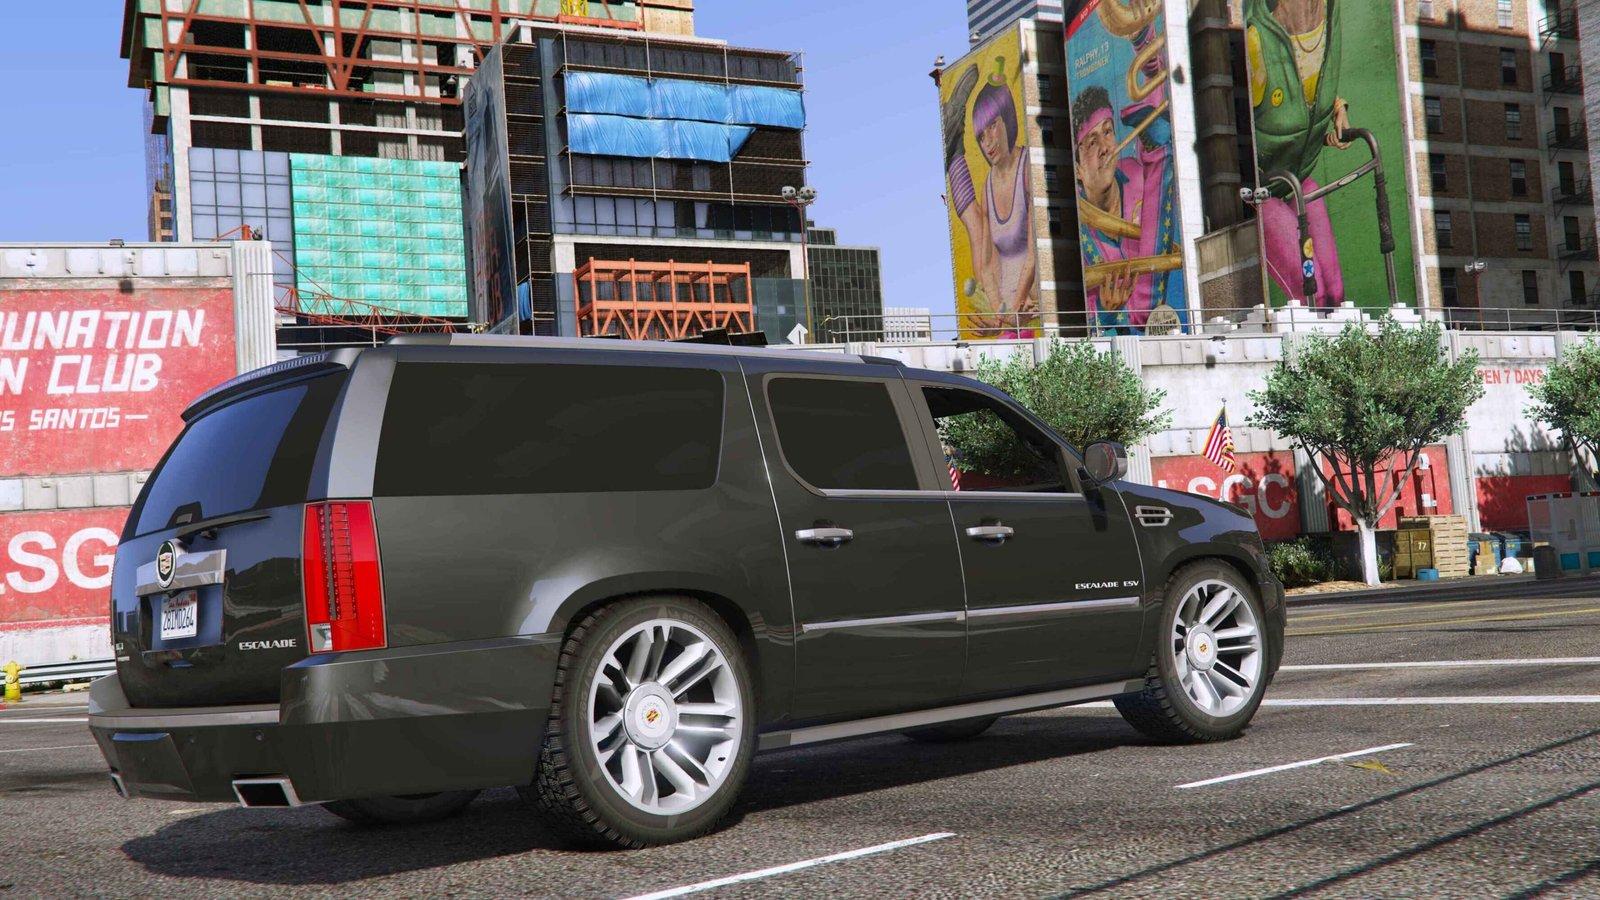 Gta Modding Com Download Area 187 Gta V 187 Cars 187 Cadillac